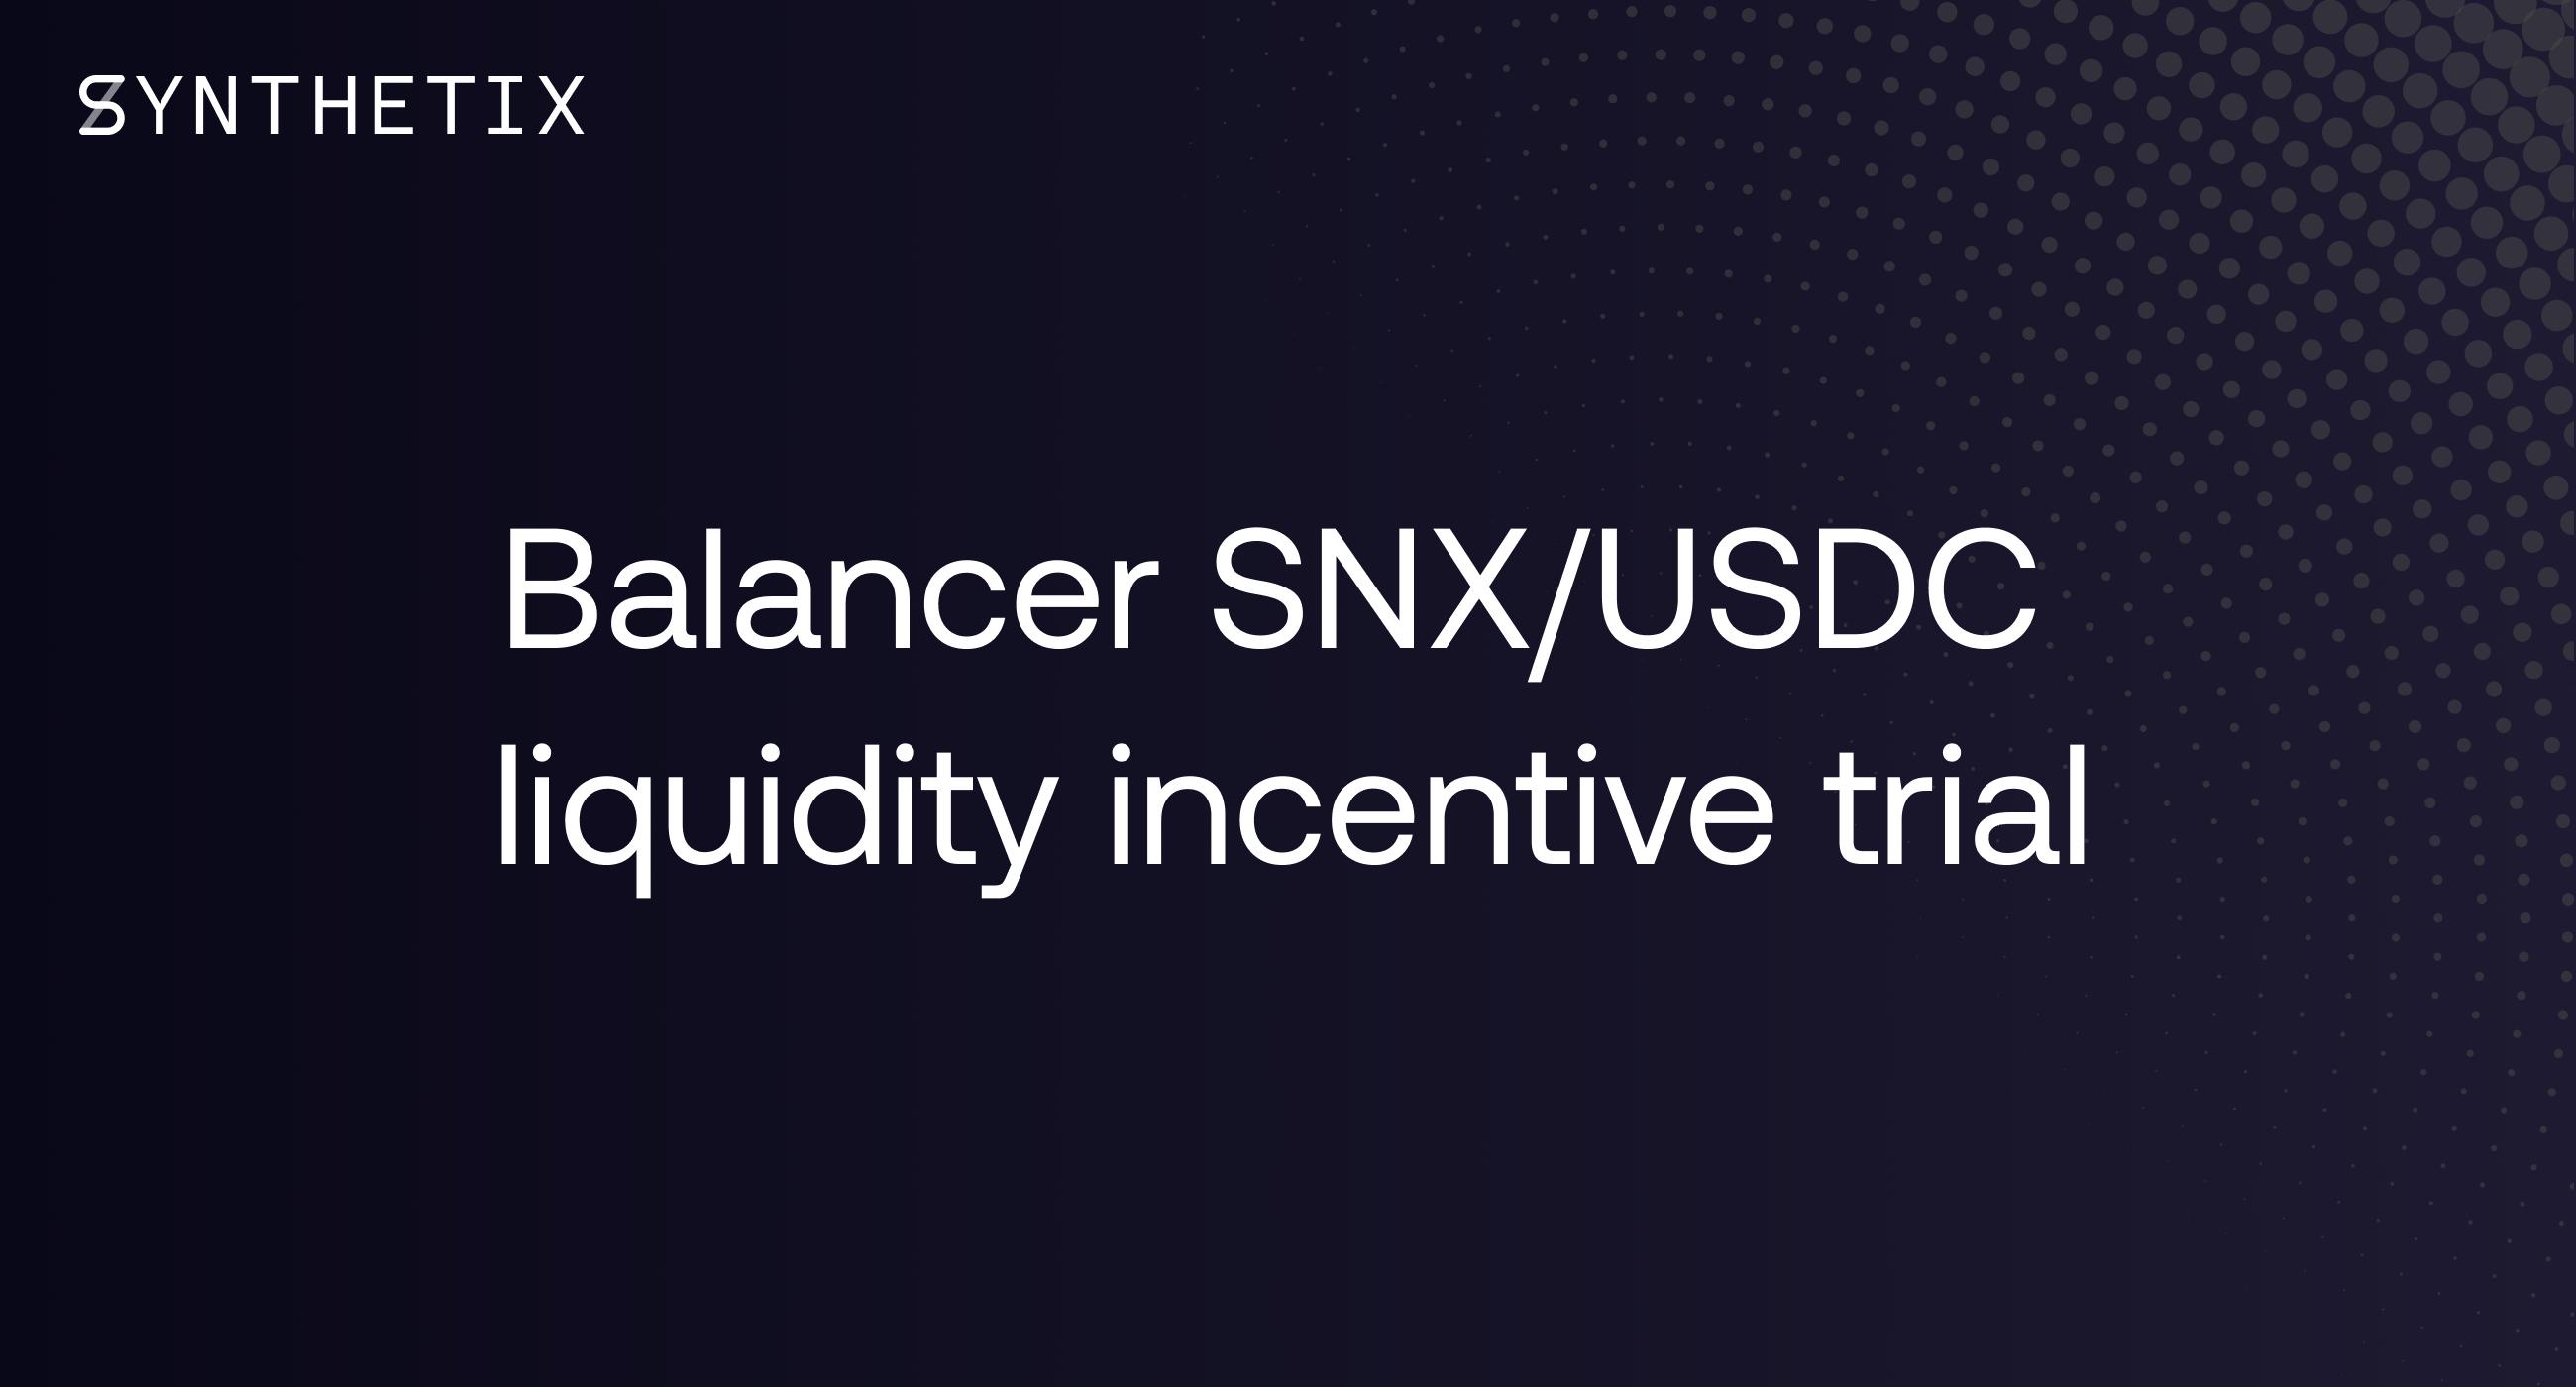 Balancer SNX/USDC liquidity trial